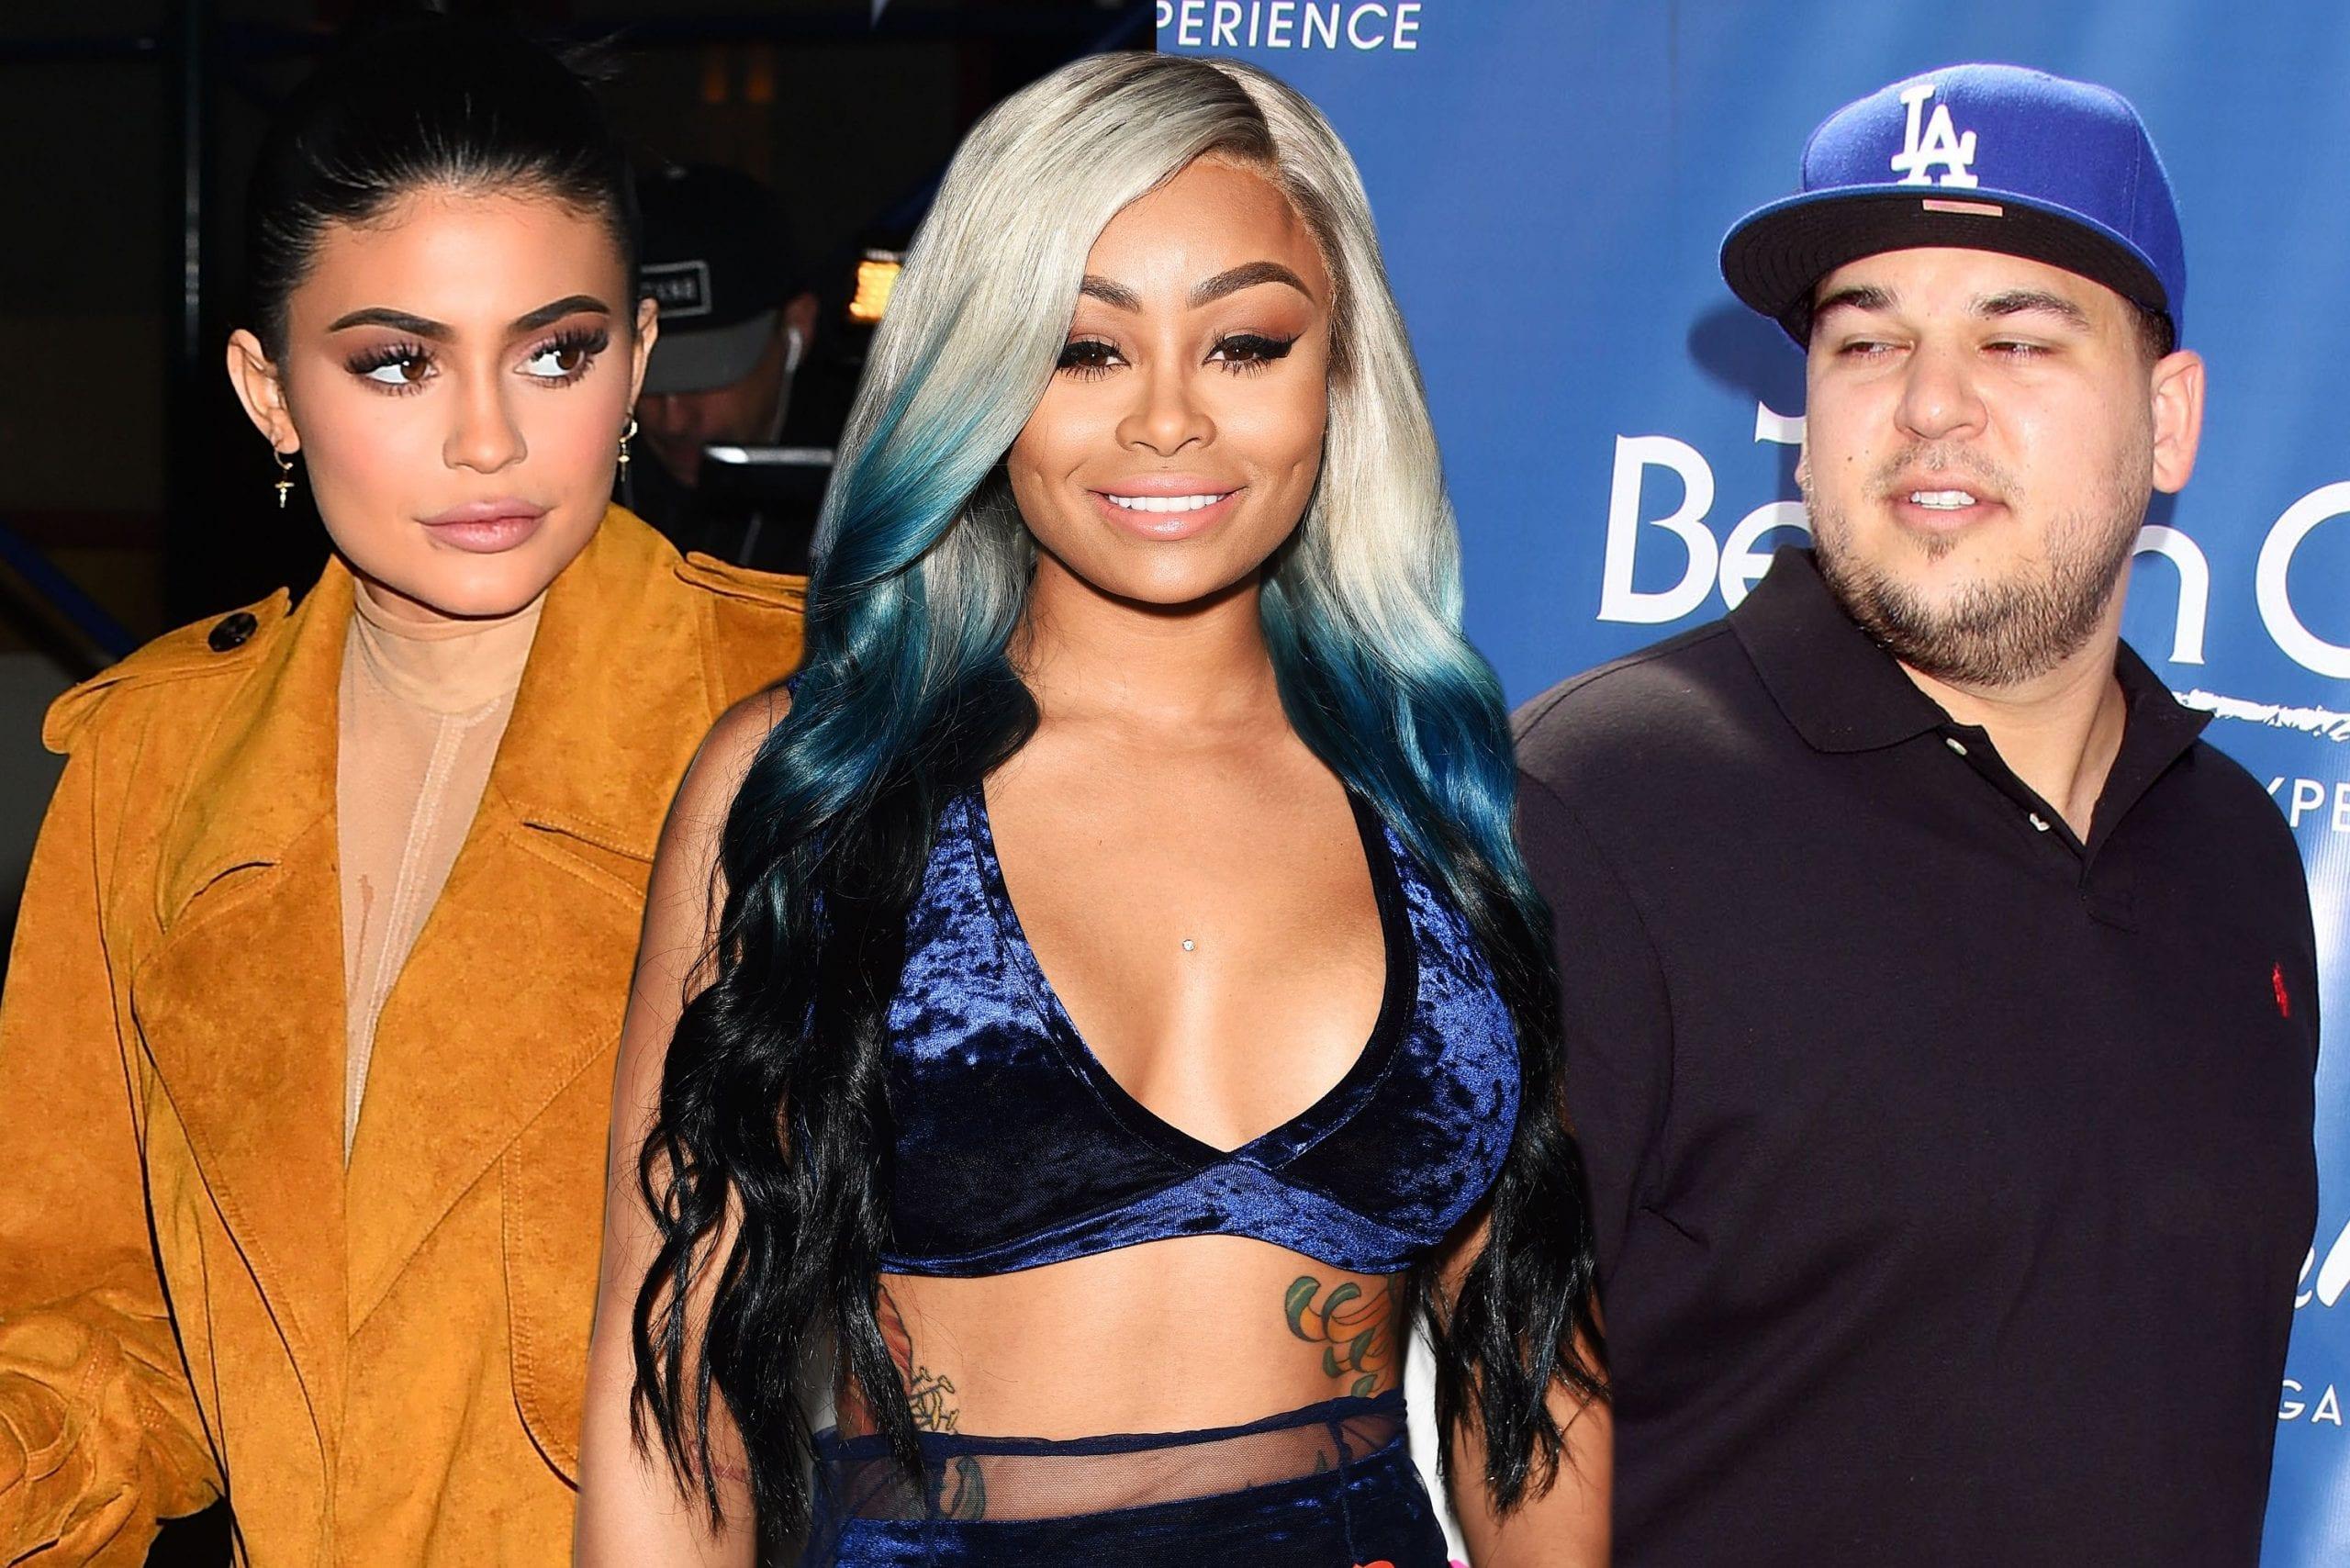 Blac Chyna and the Kardashians